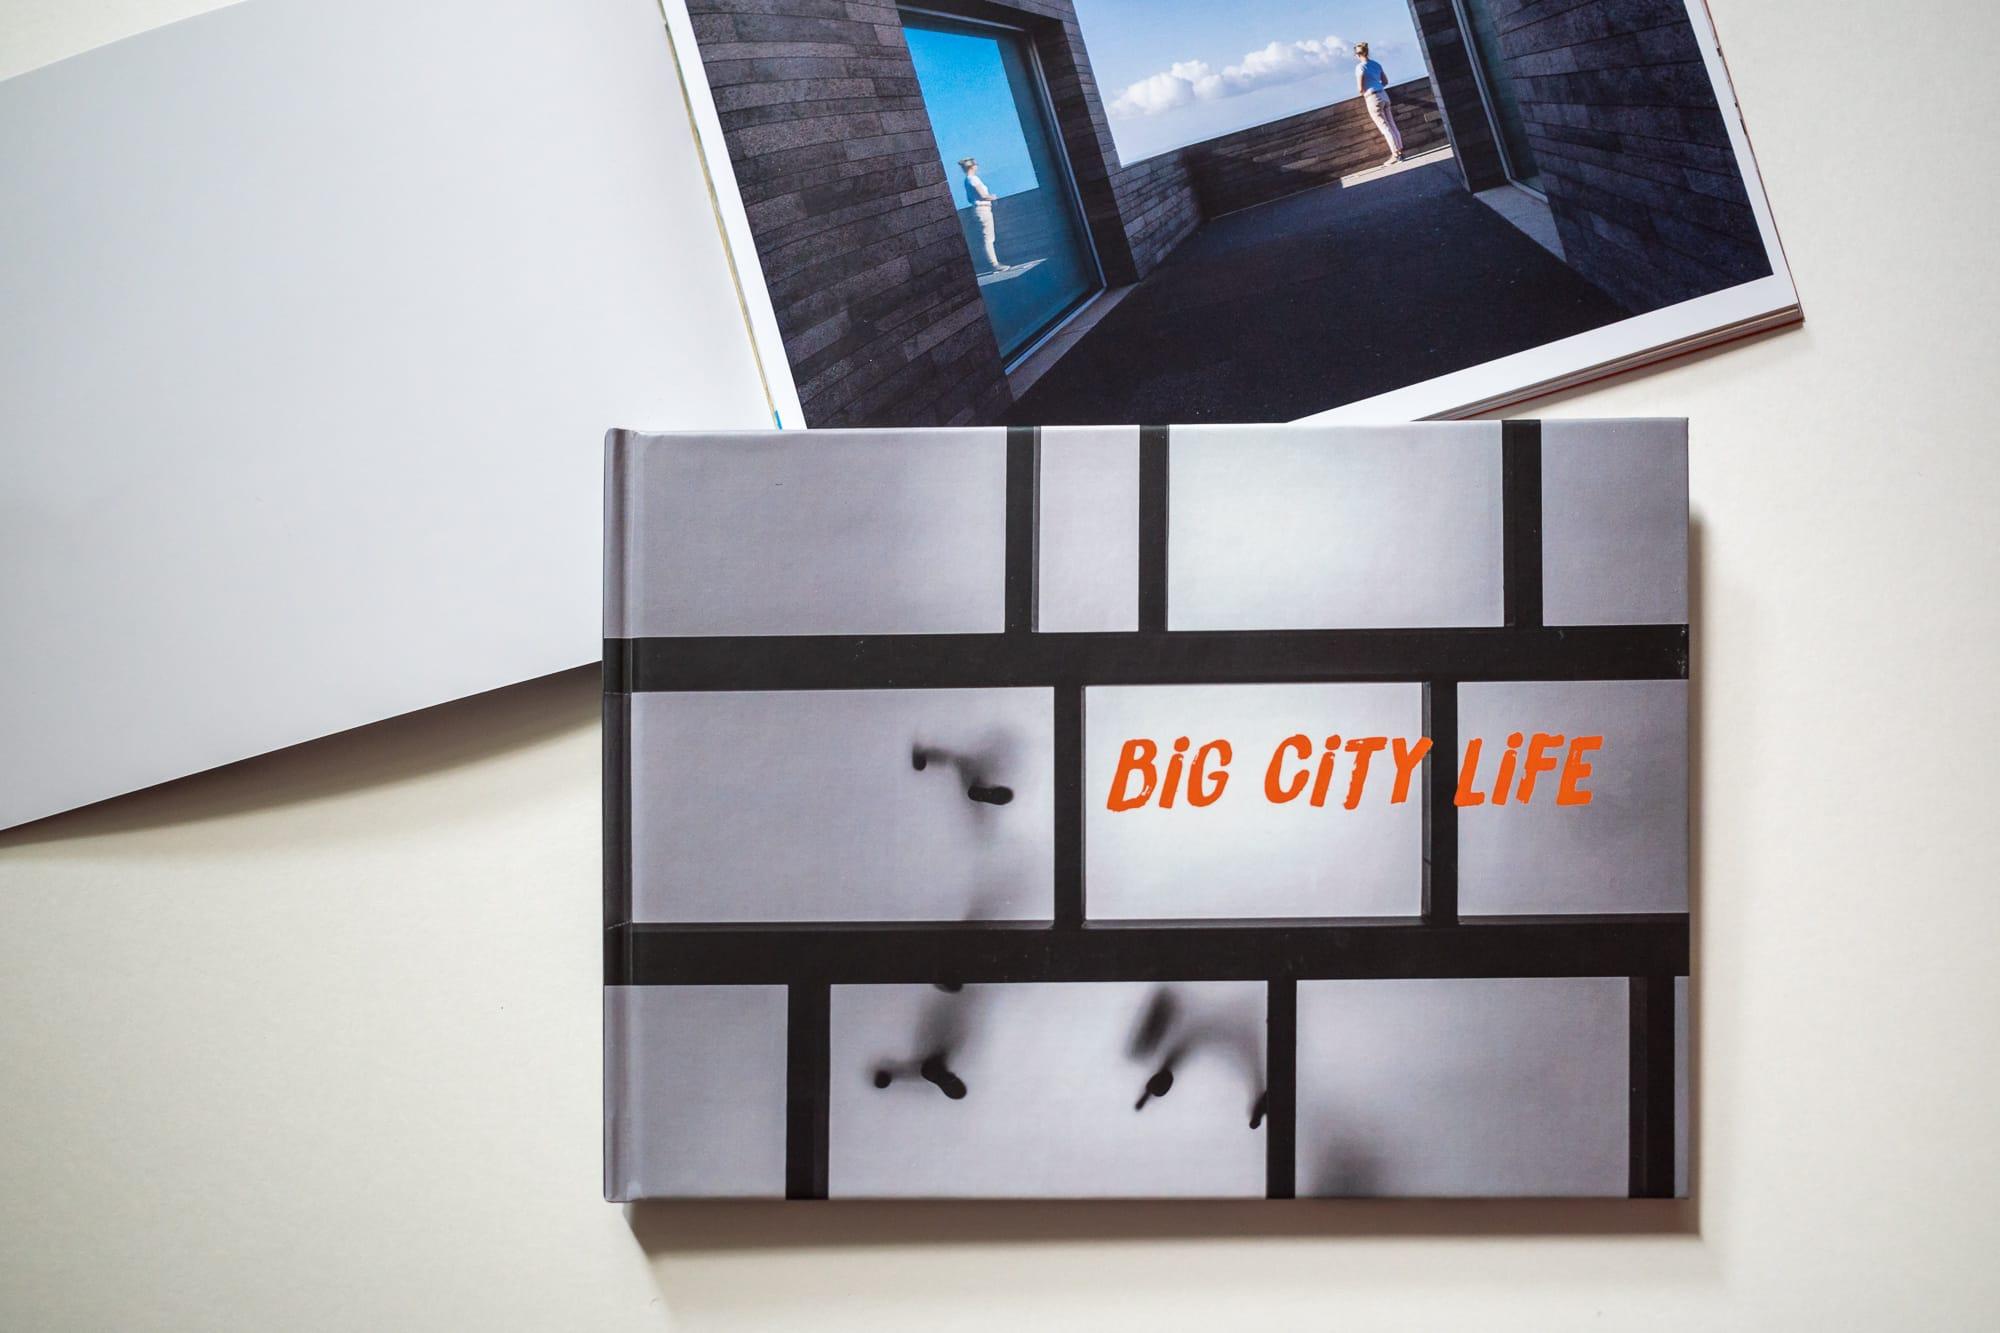 querformat-fotografie - Achim Katzberg - querformat-fotografie_BiG_CiTY_LiFE_neu-001-1